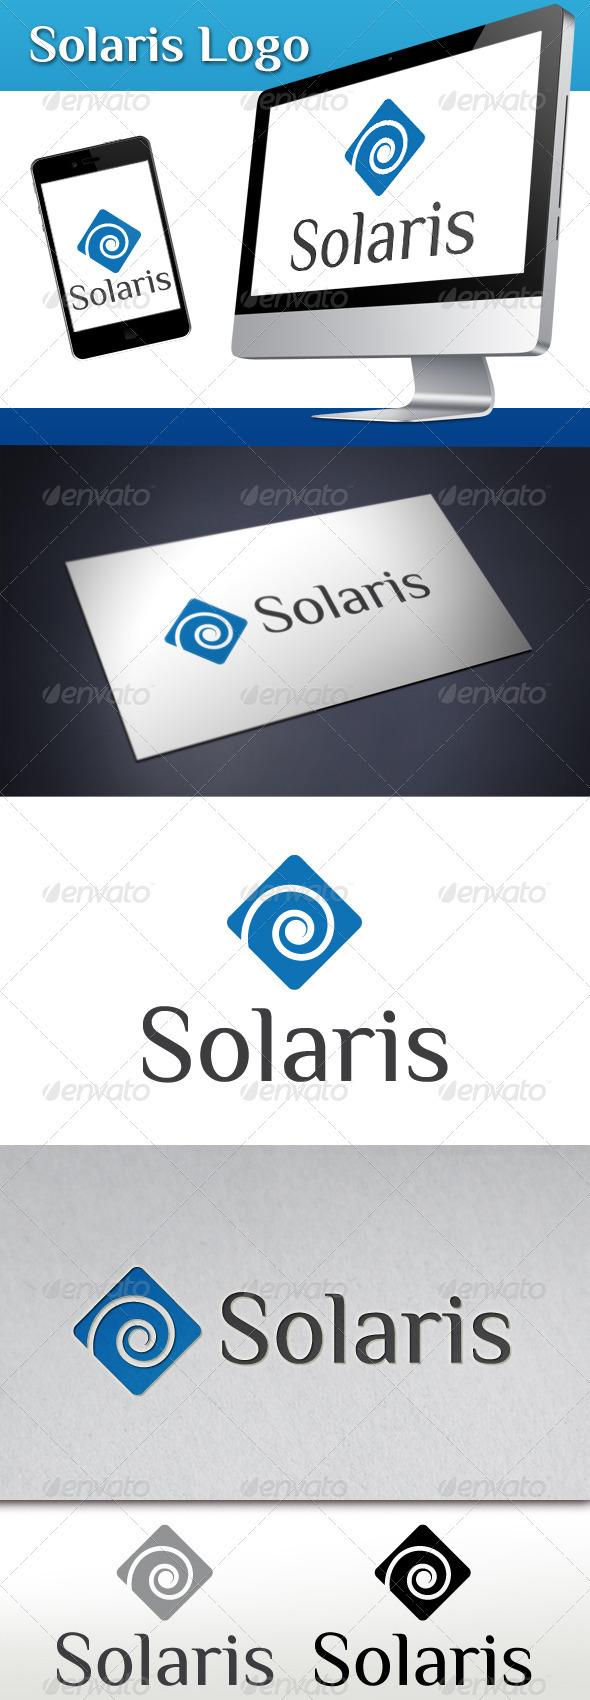 GraphicRiver Solaris Logo Template 3567786